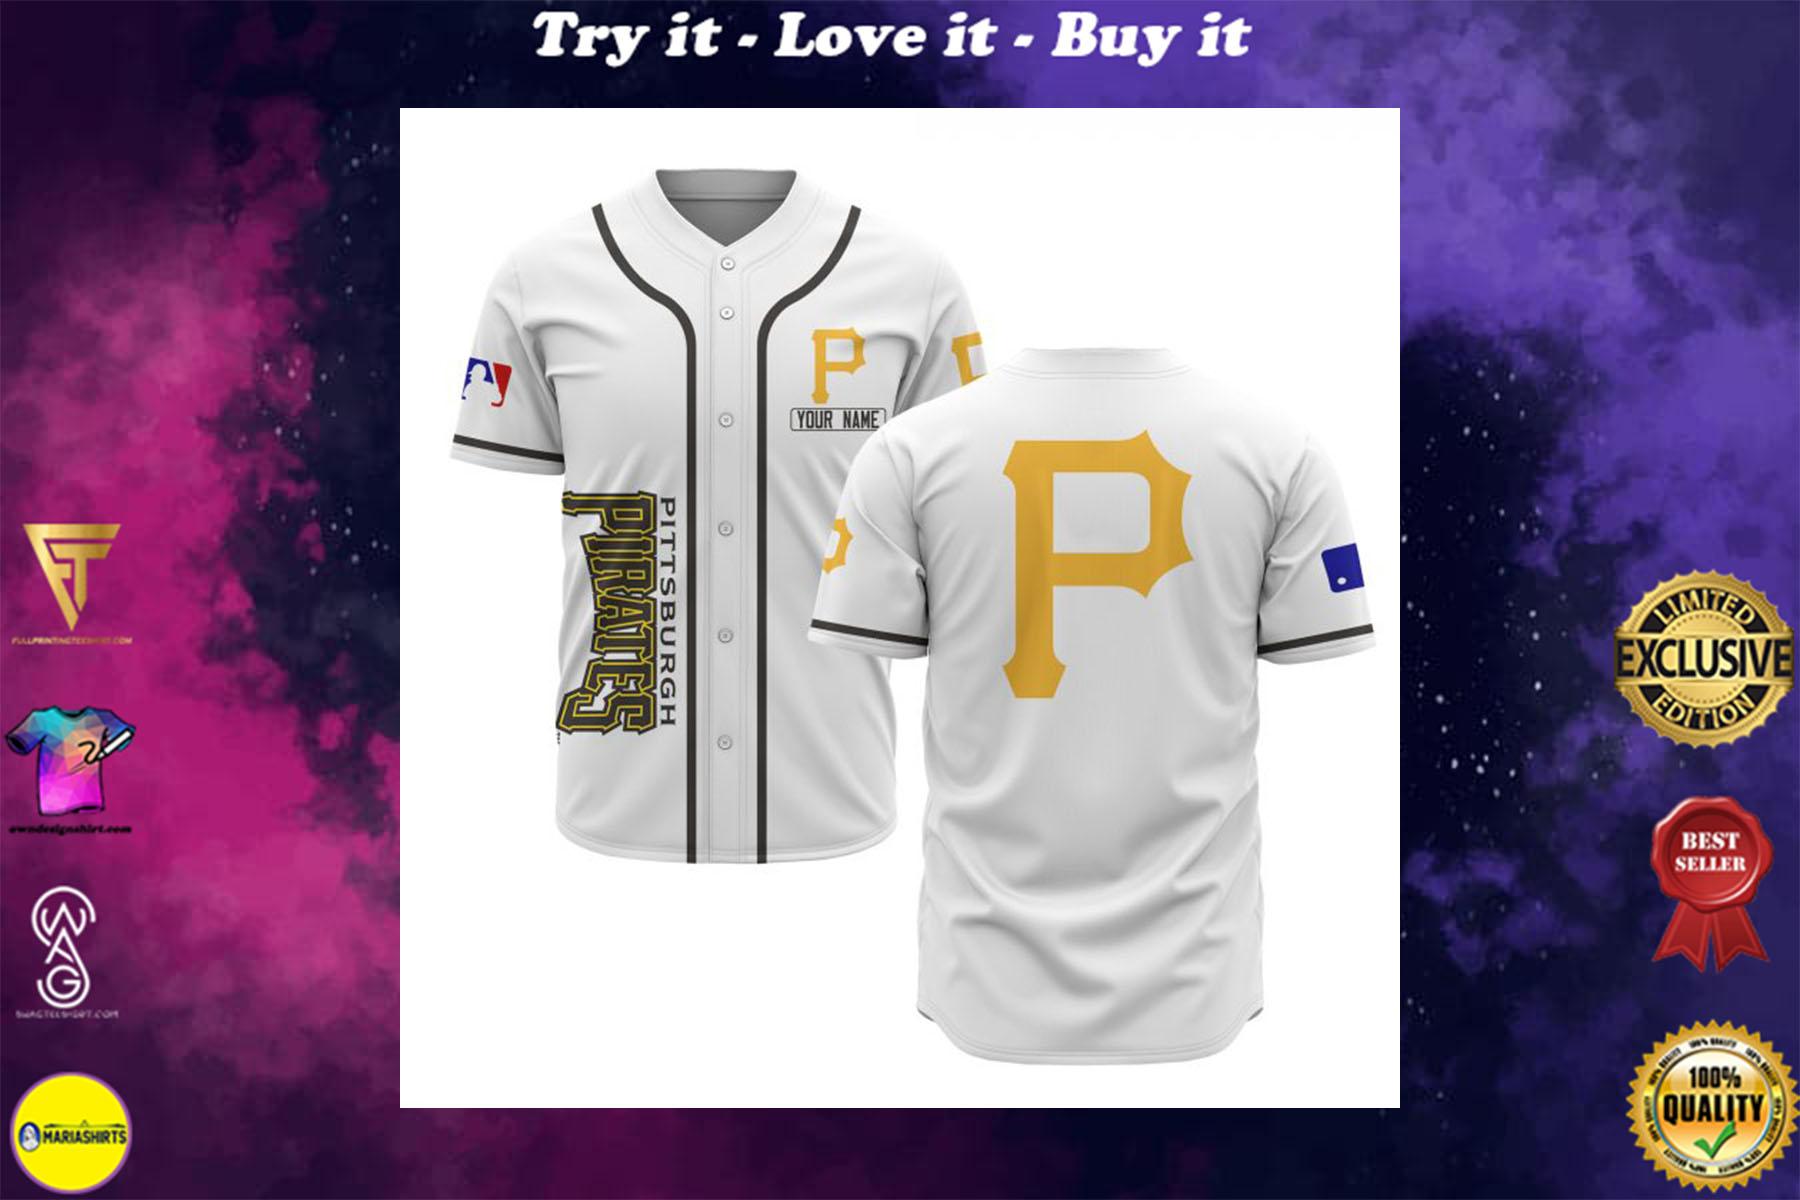 [special edition] custom name pittsburgh pirates baseball shirt - maria